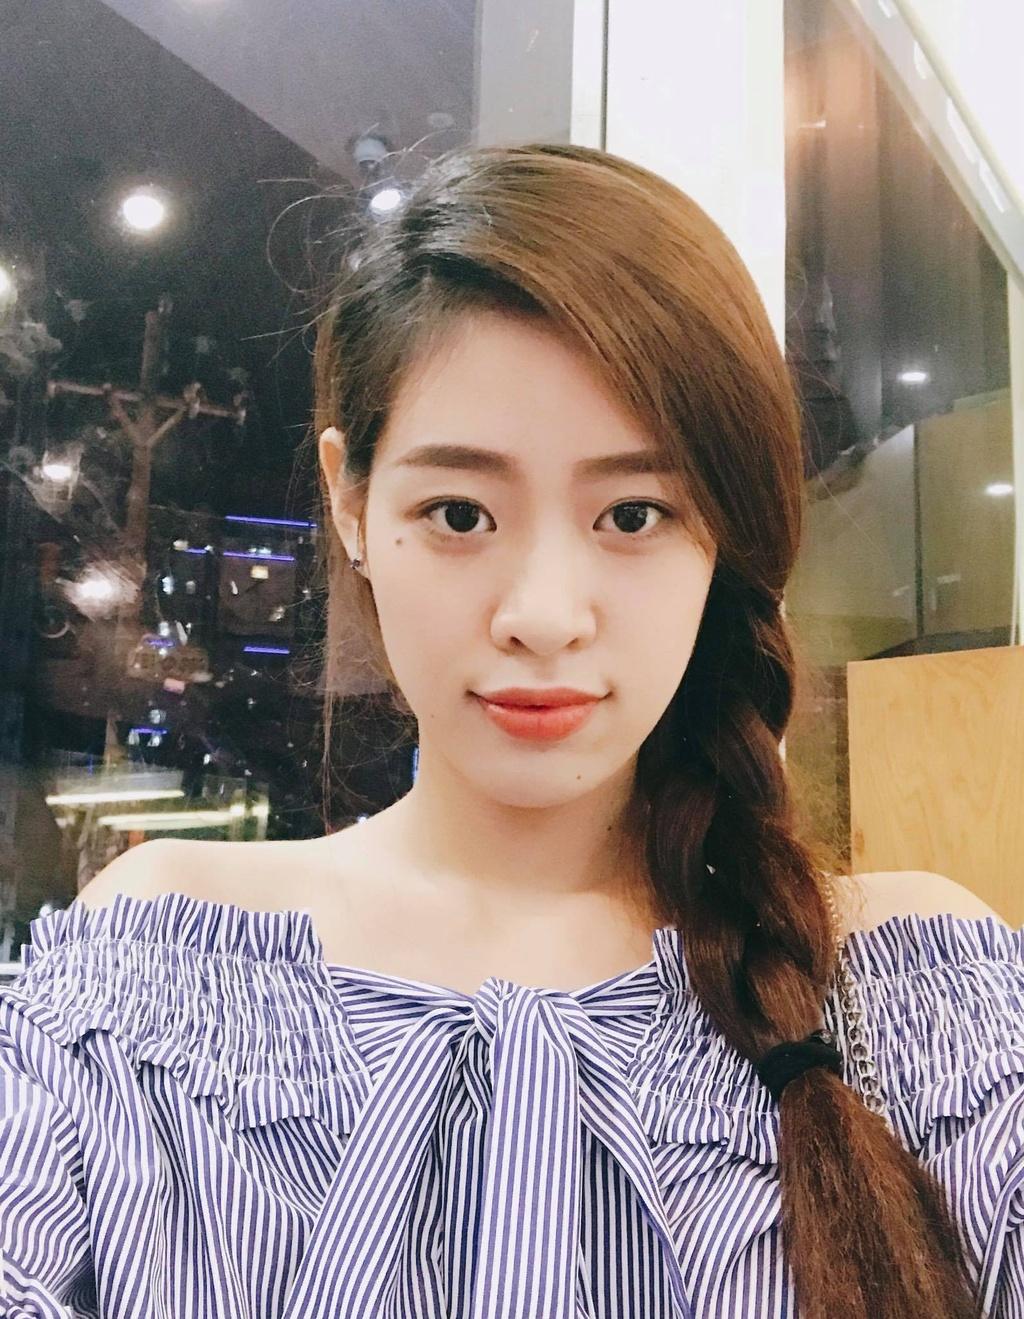 Nhan sac doi thuong cua Hoa hau Hoan vu Viet Nam Khanh Van hinh anh 8